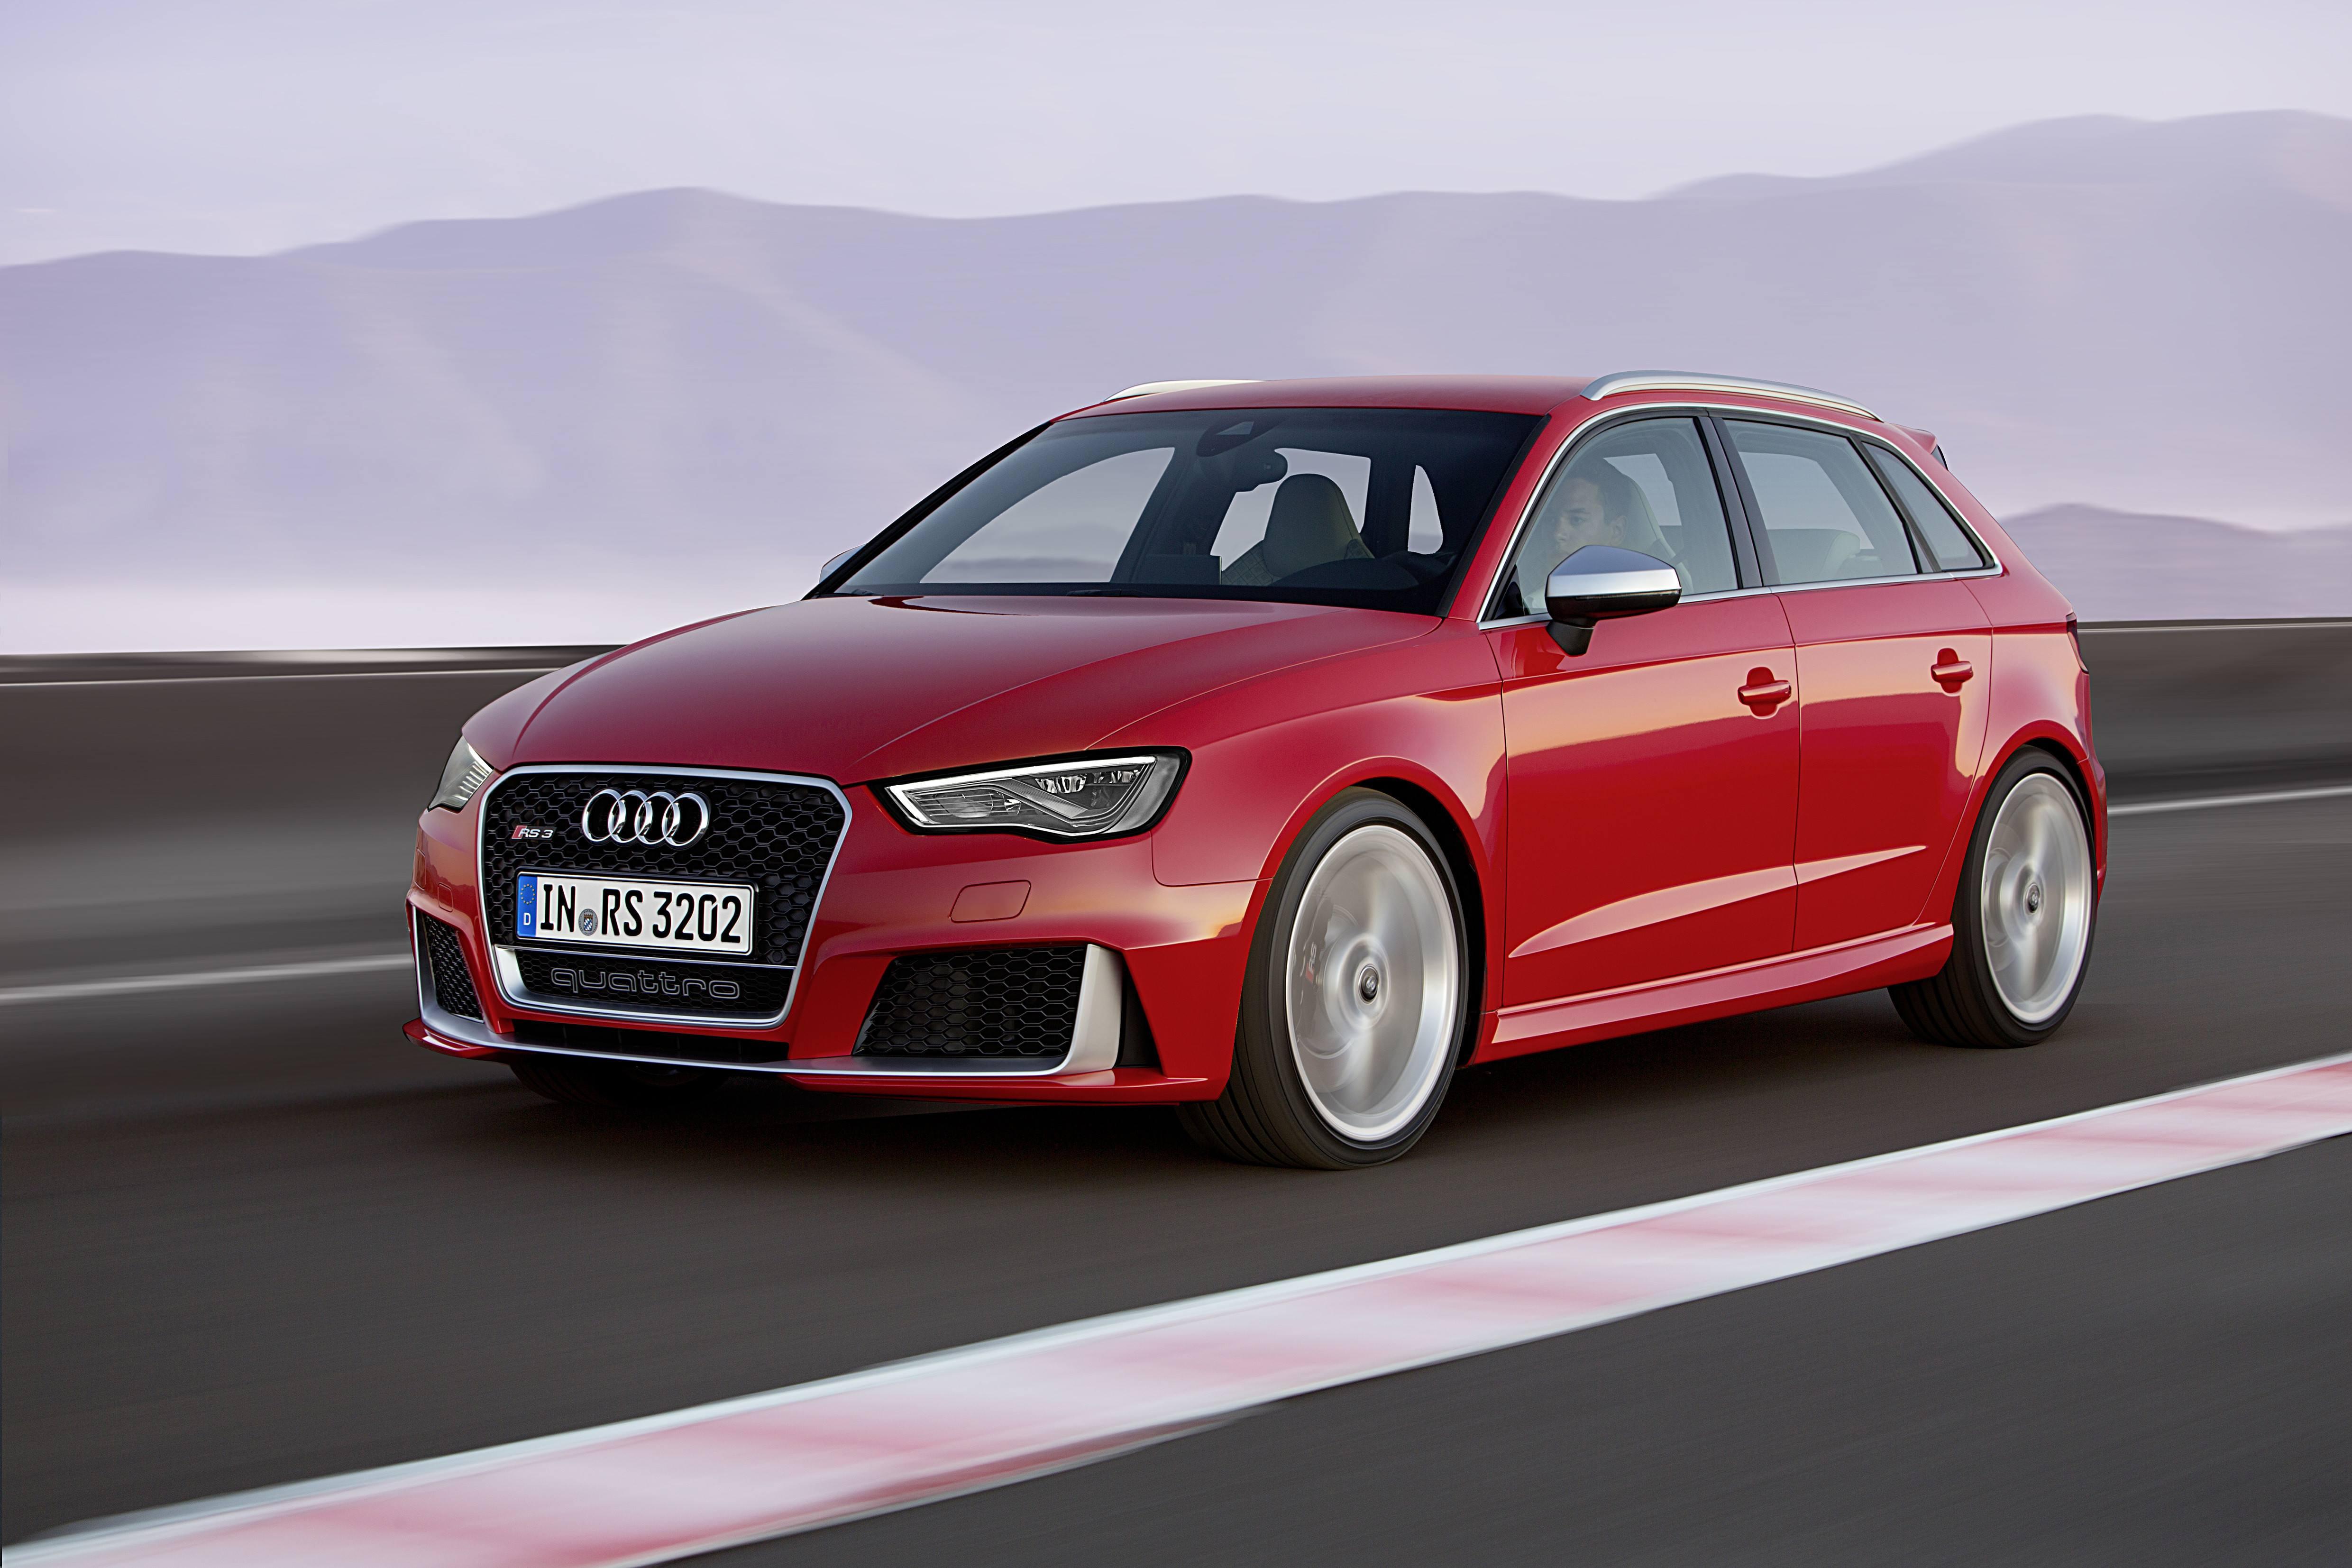 Audi 2.5 TFSI Engine Specs and Performance